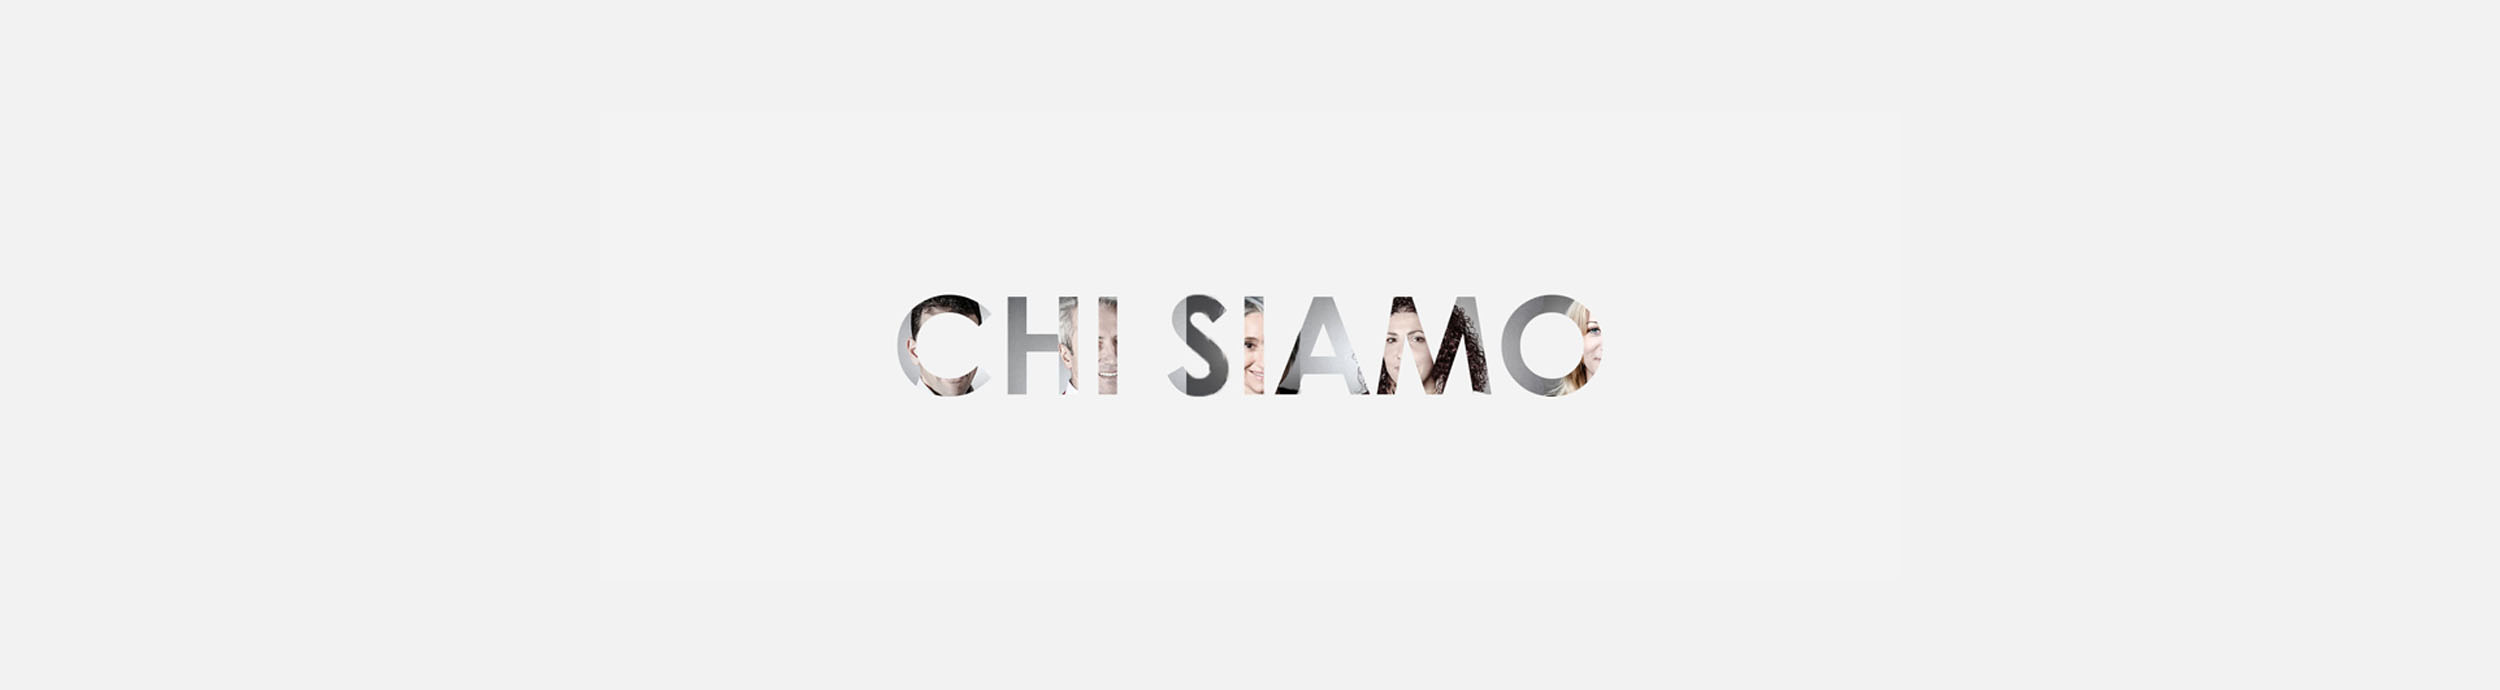 chi-shiamo-1-1